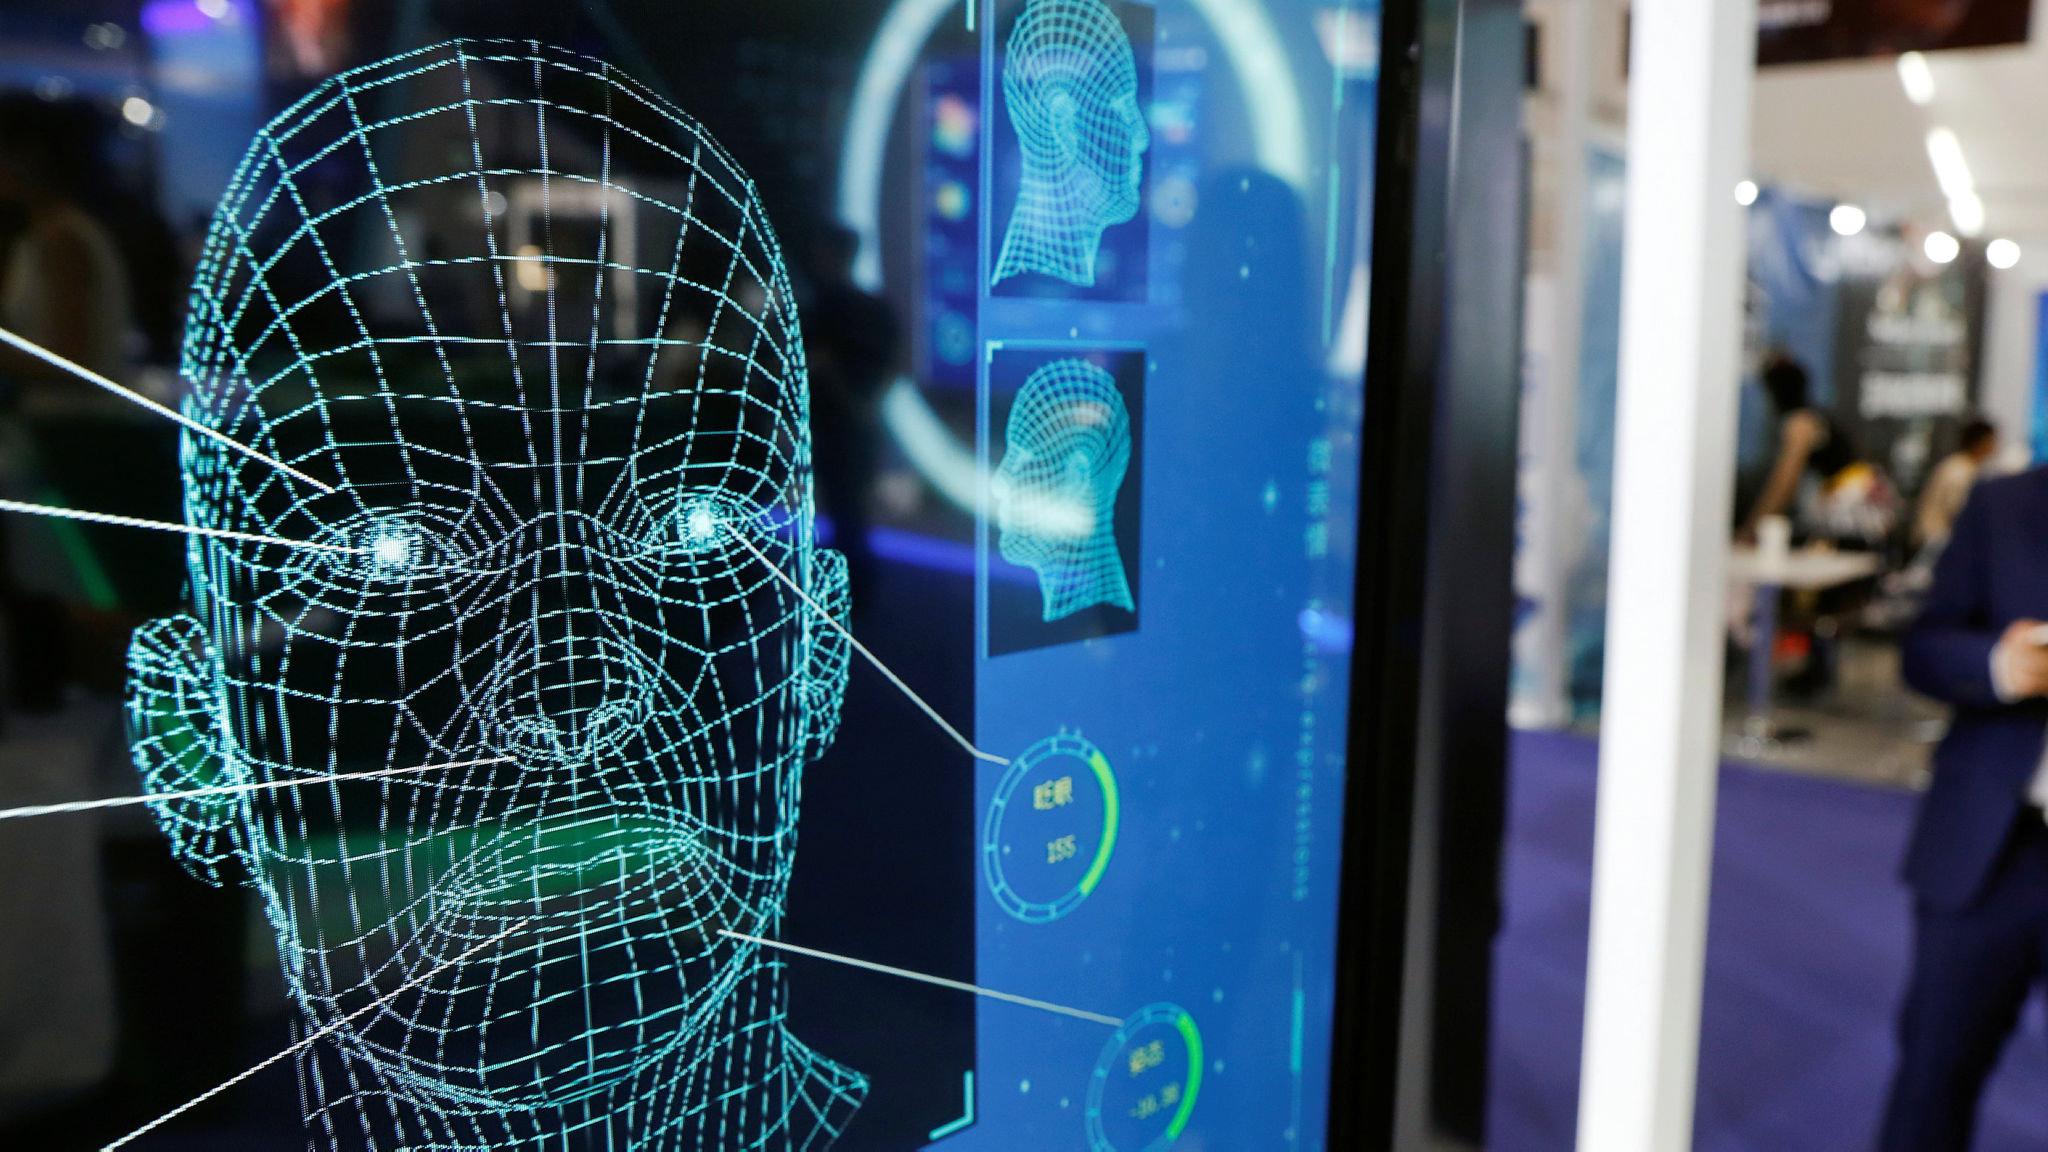 Taser stun gun maker files facial recognition patents